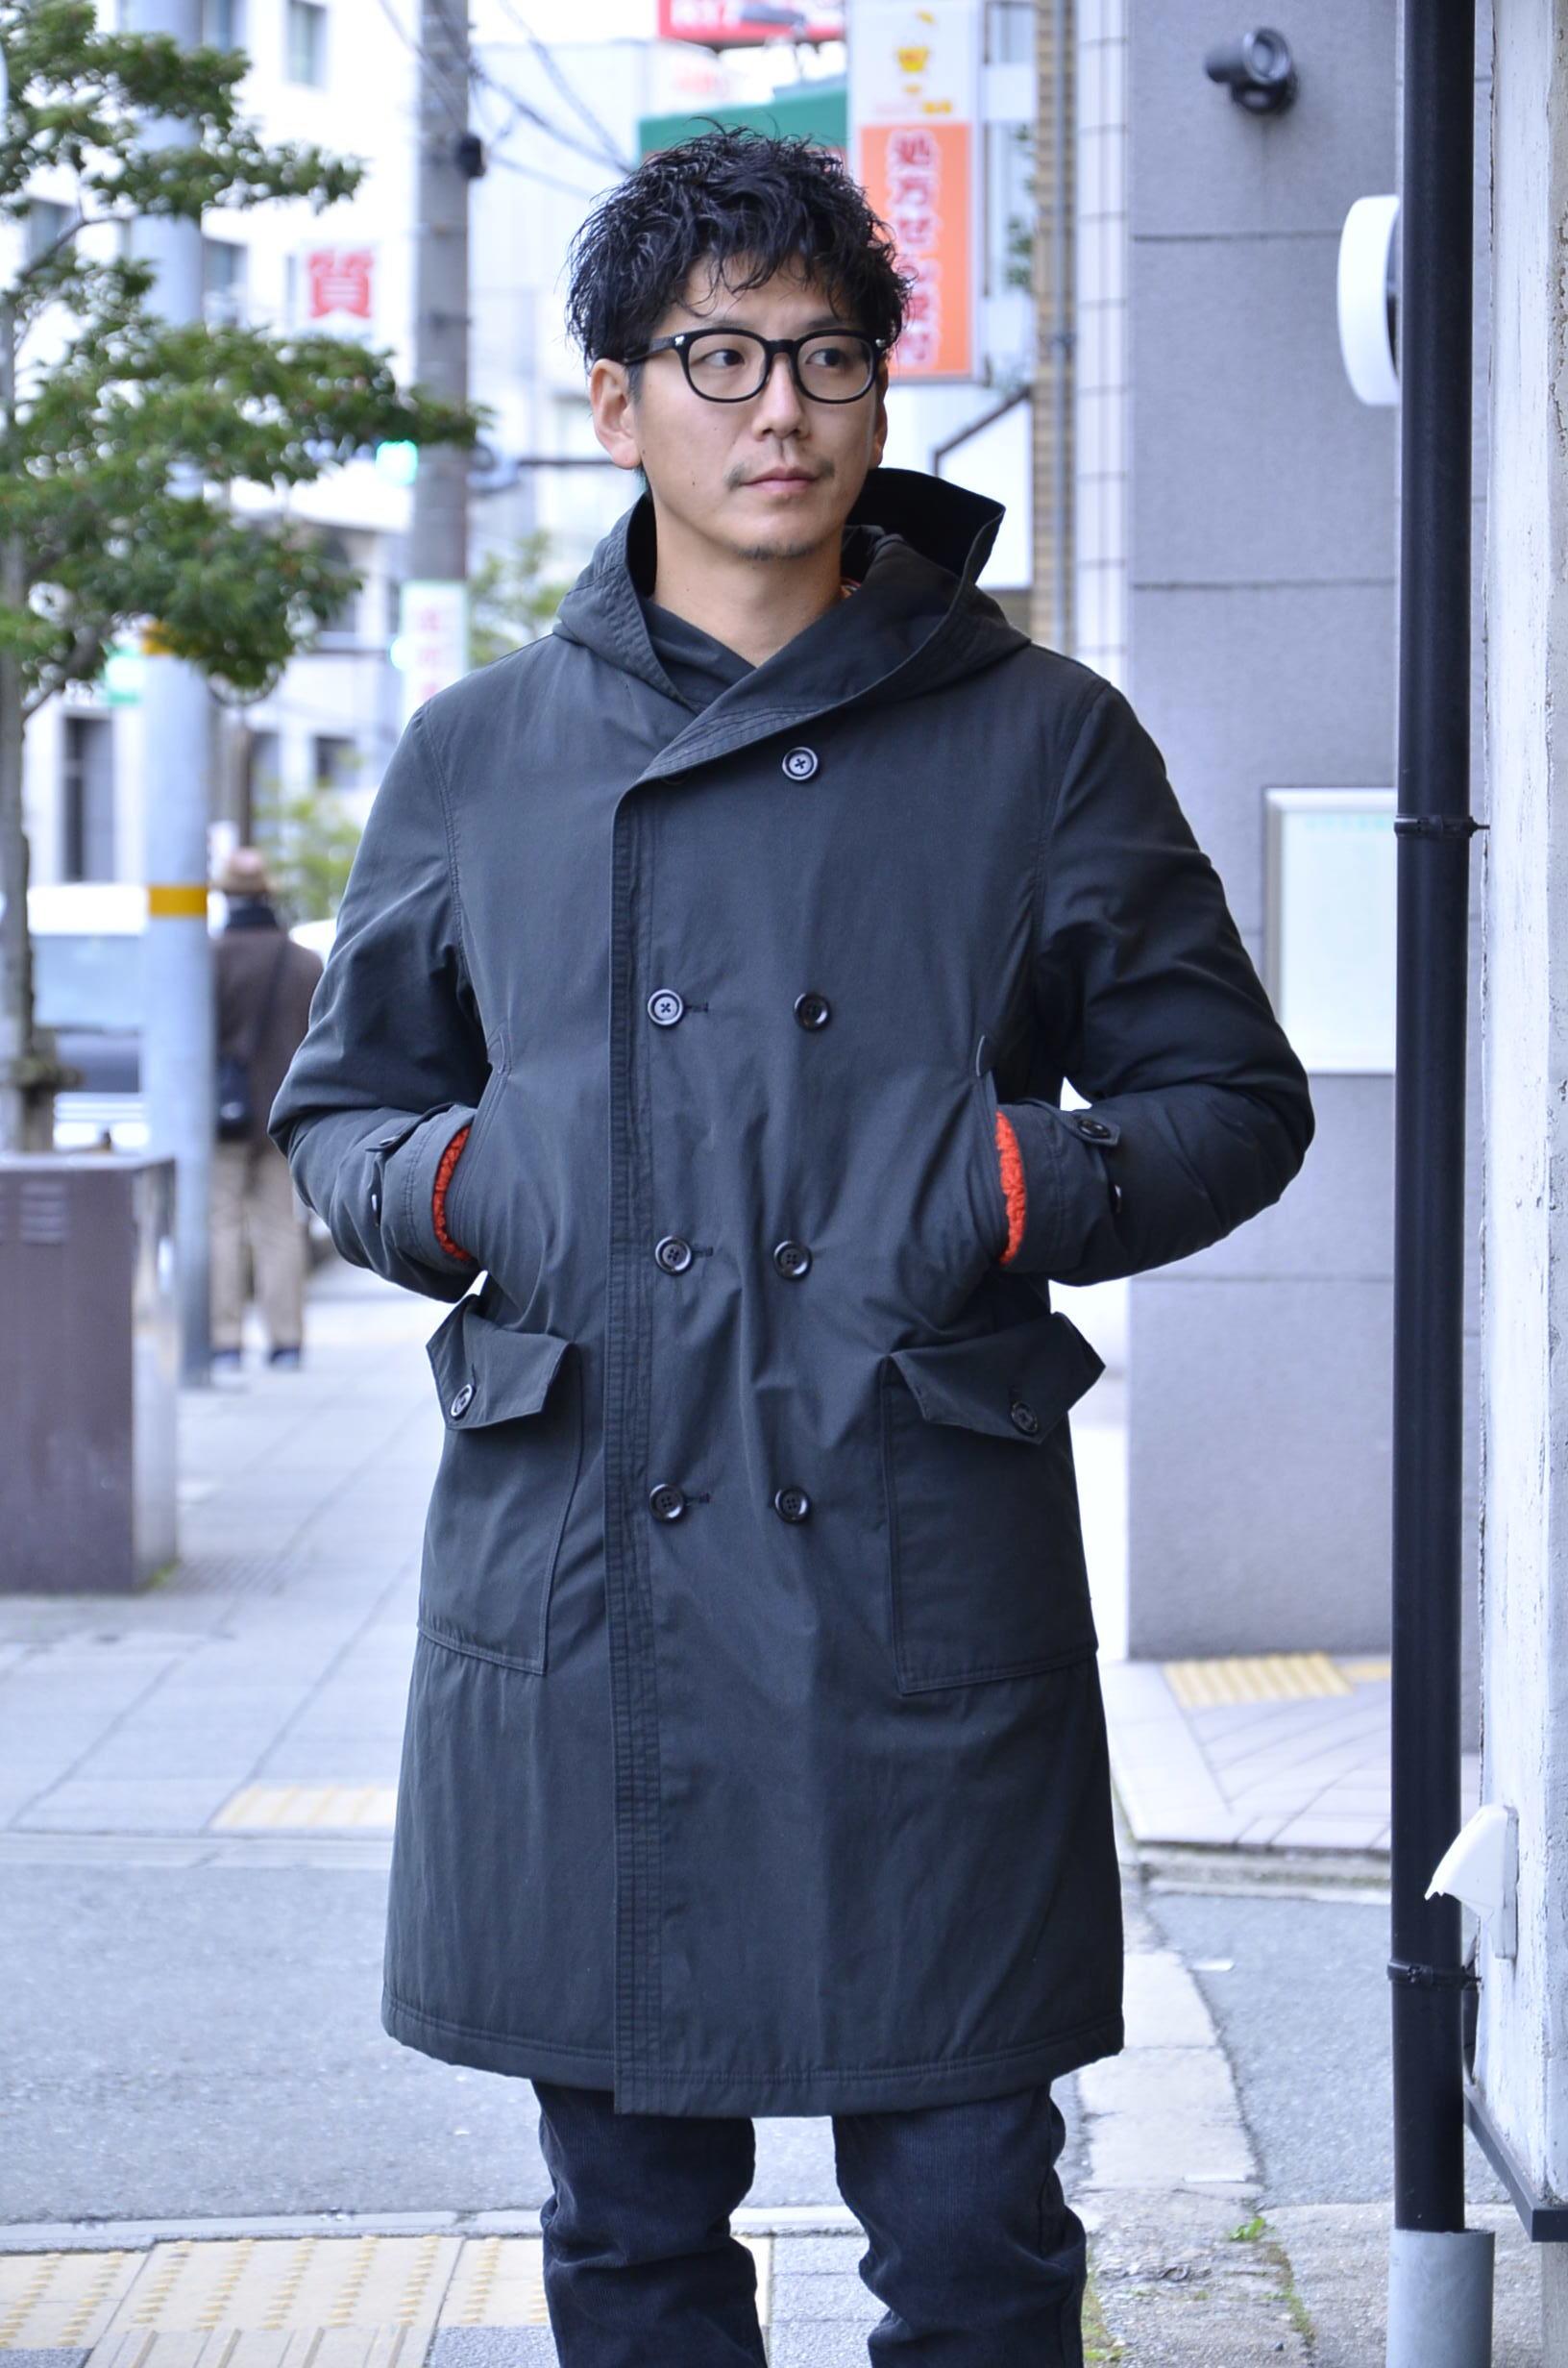 "\""Jackman\""<<Spectator Coat>>Style~TKB~_c0167336_17362705.jpg"